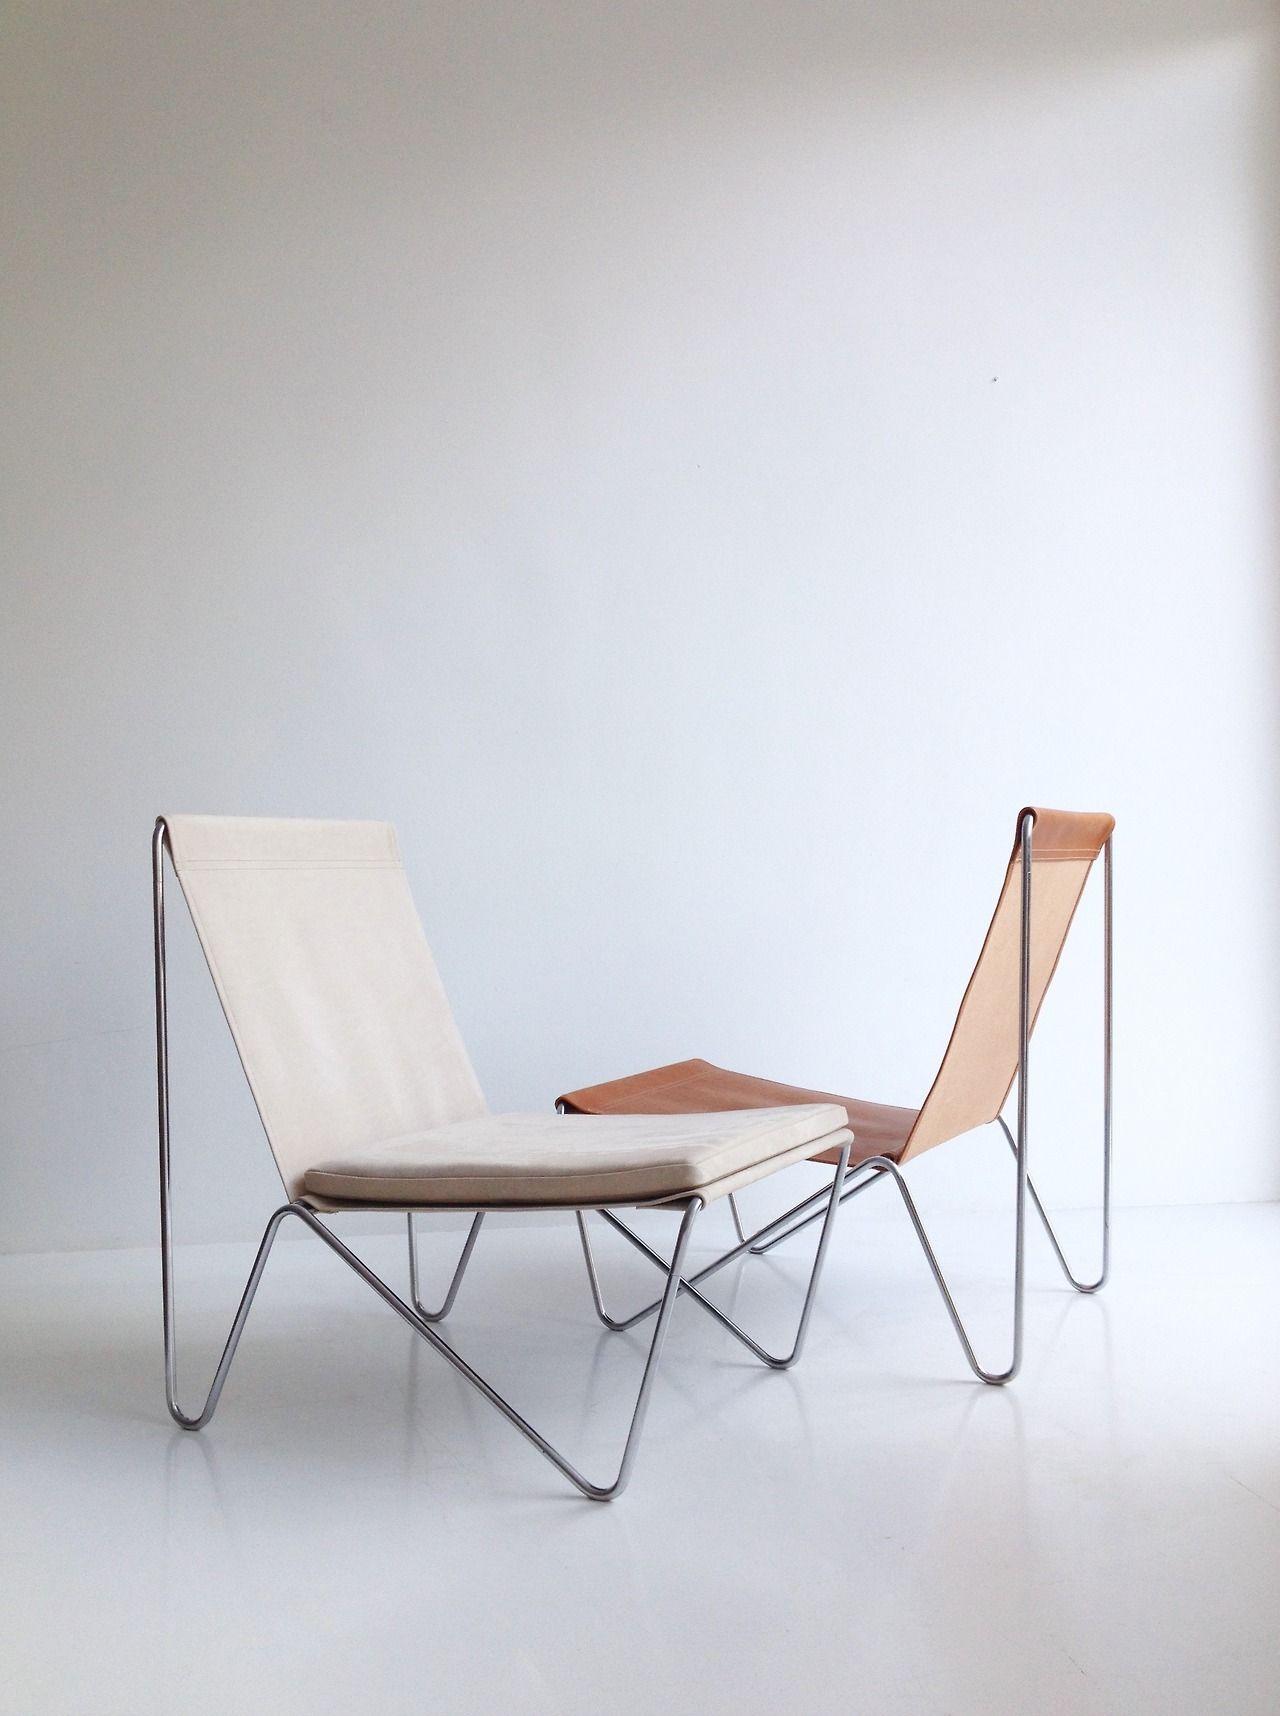 Verner Panton. The Bachelor chair. #ChairRestaurant | Møbler